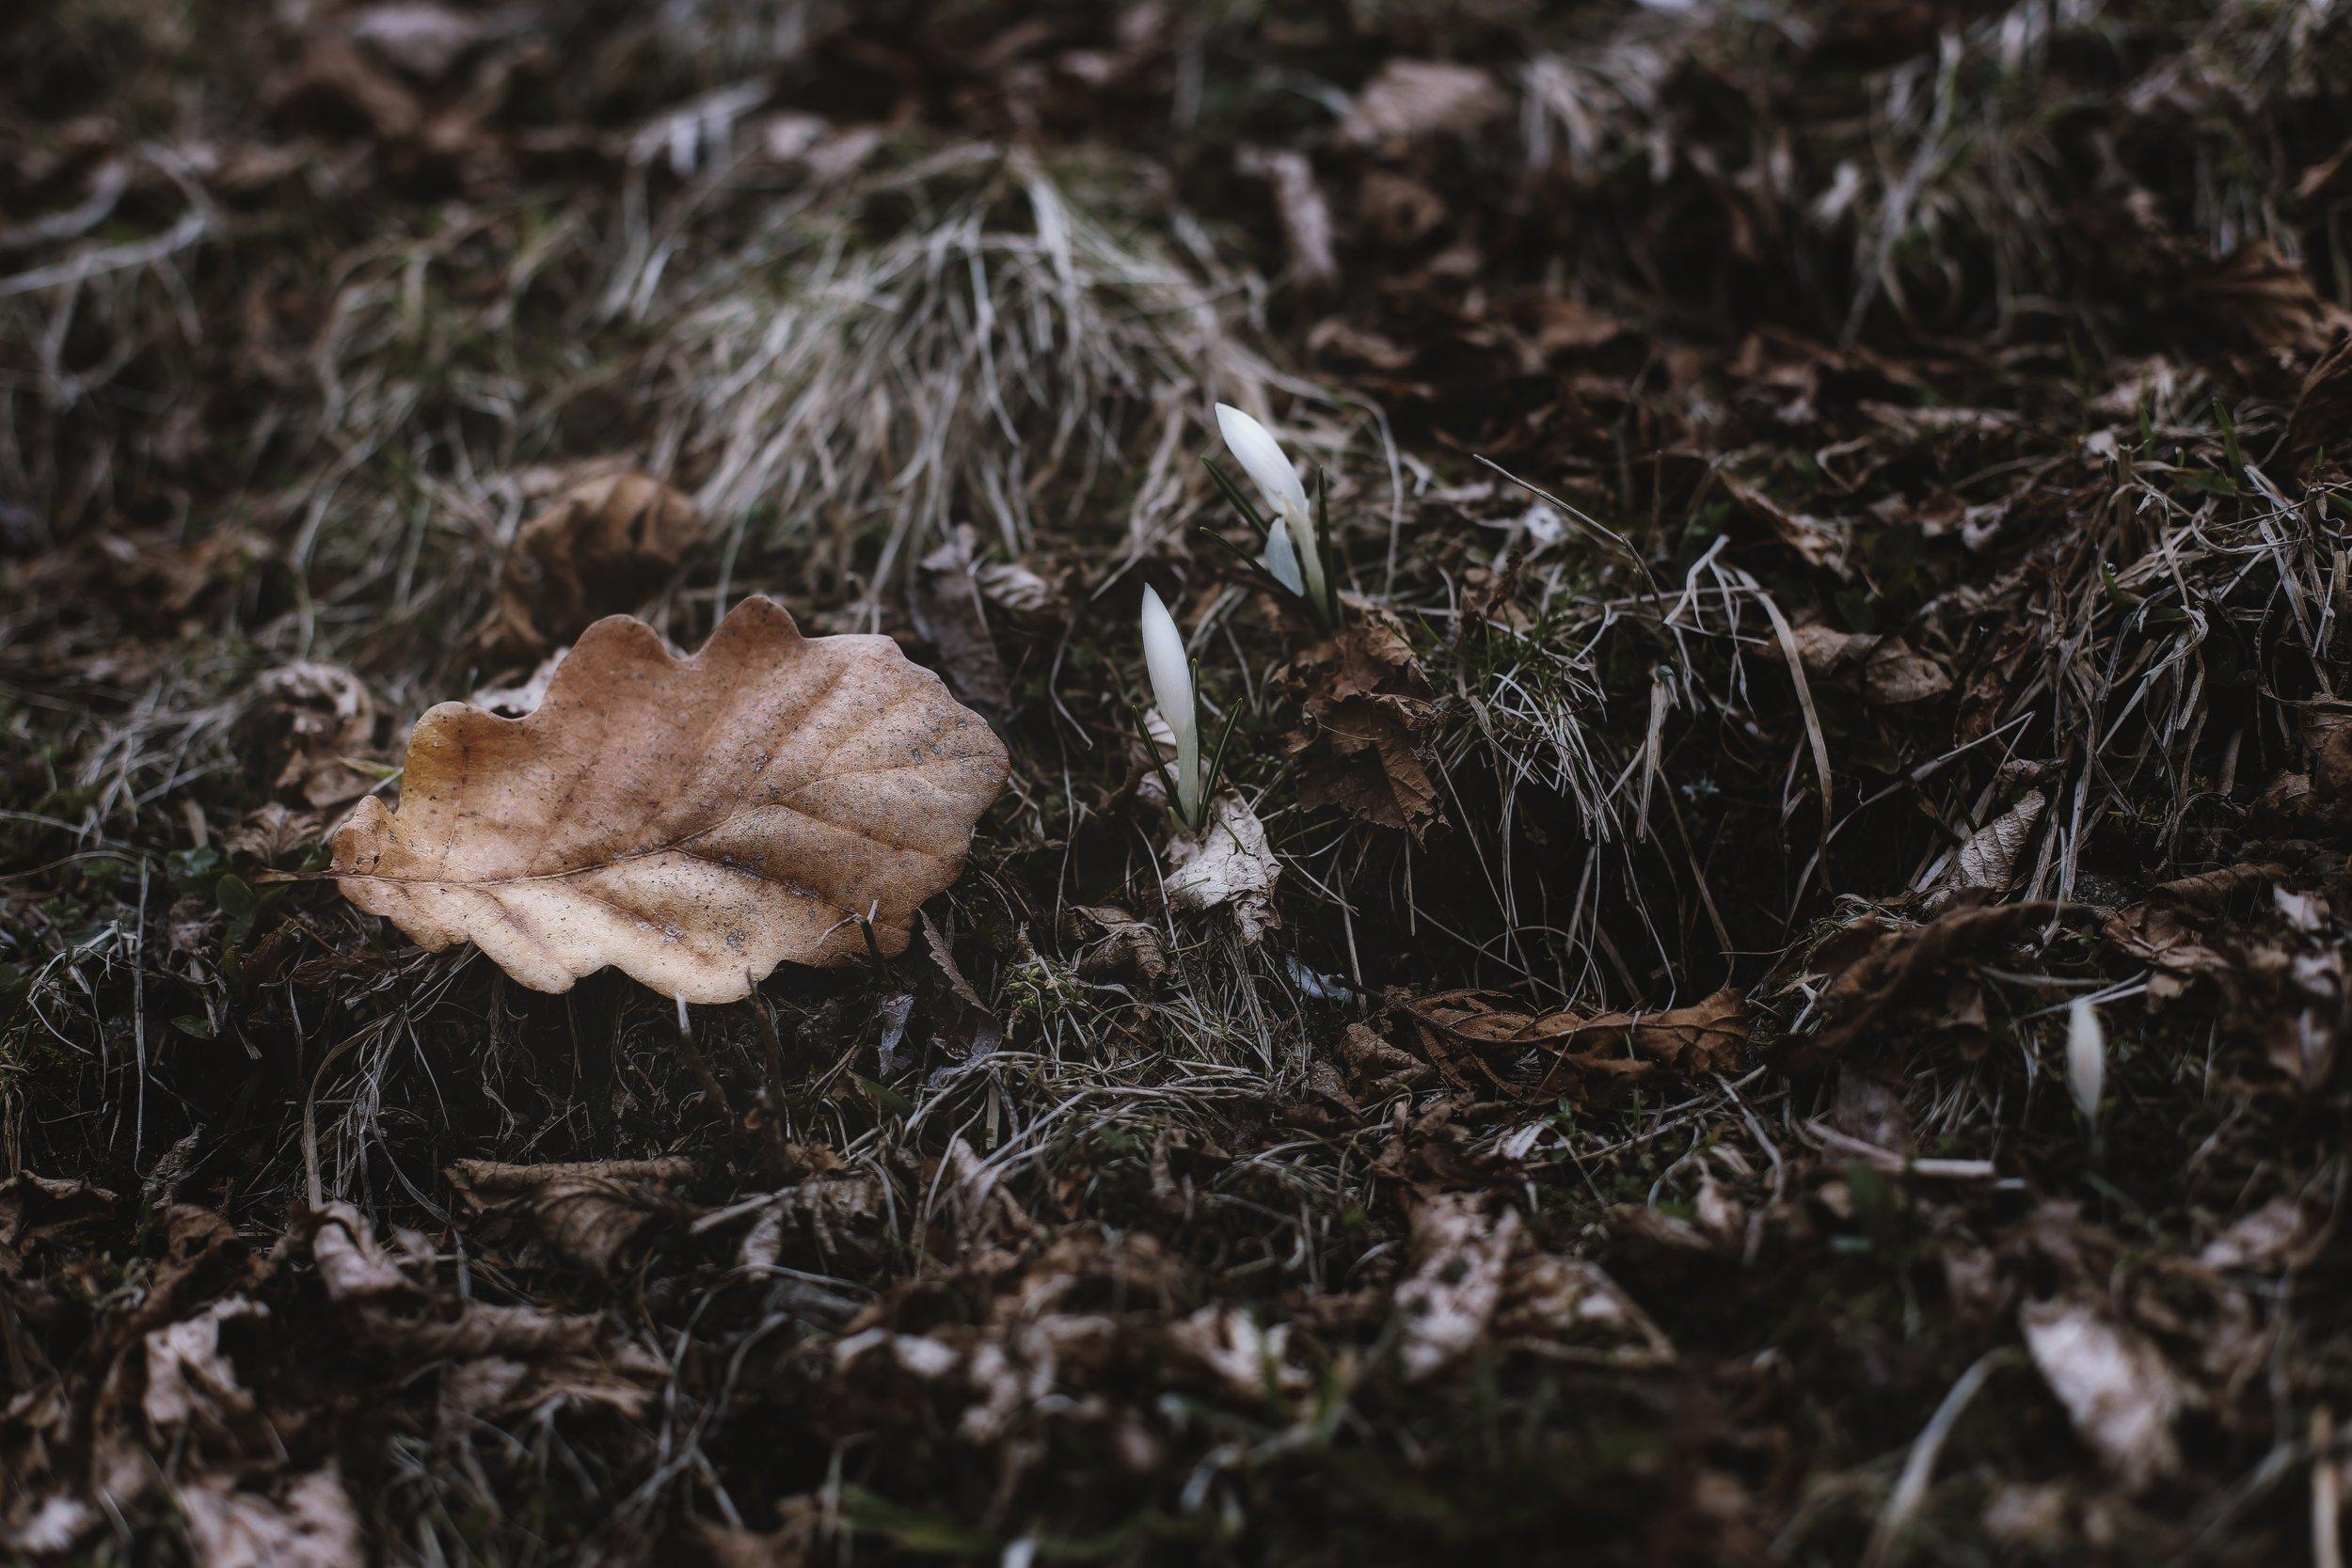 close-up-dirt-dried-leaf-1000078.jpg